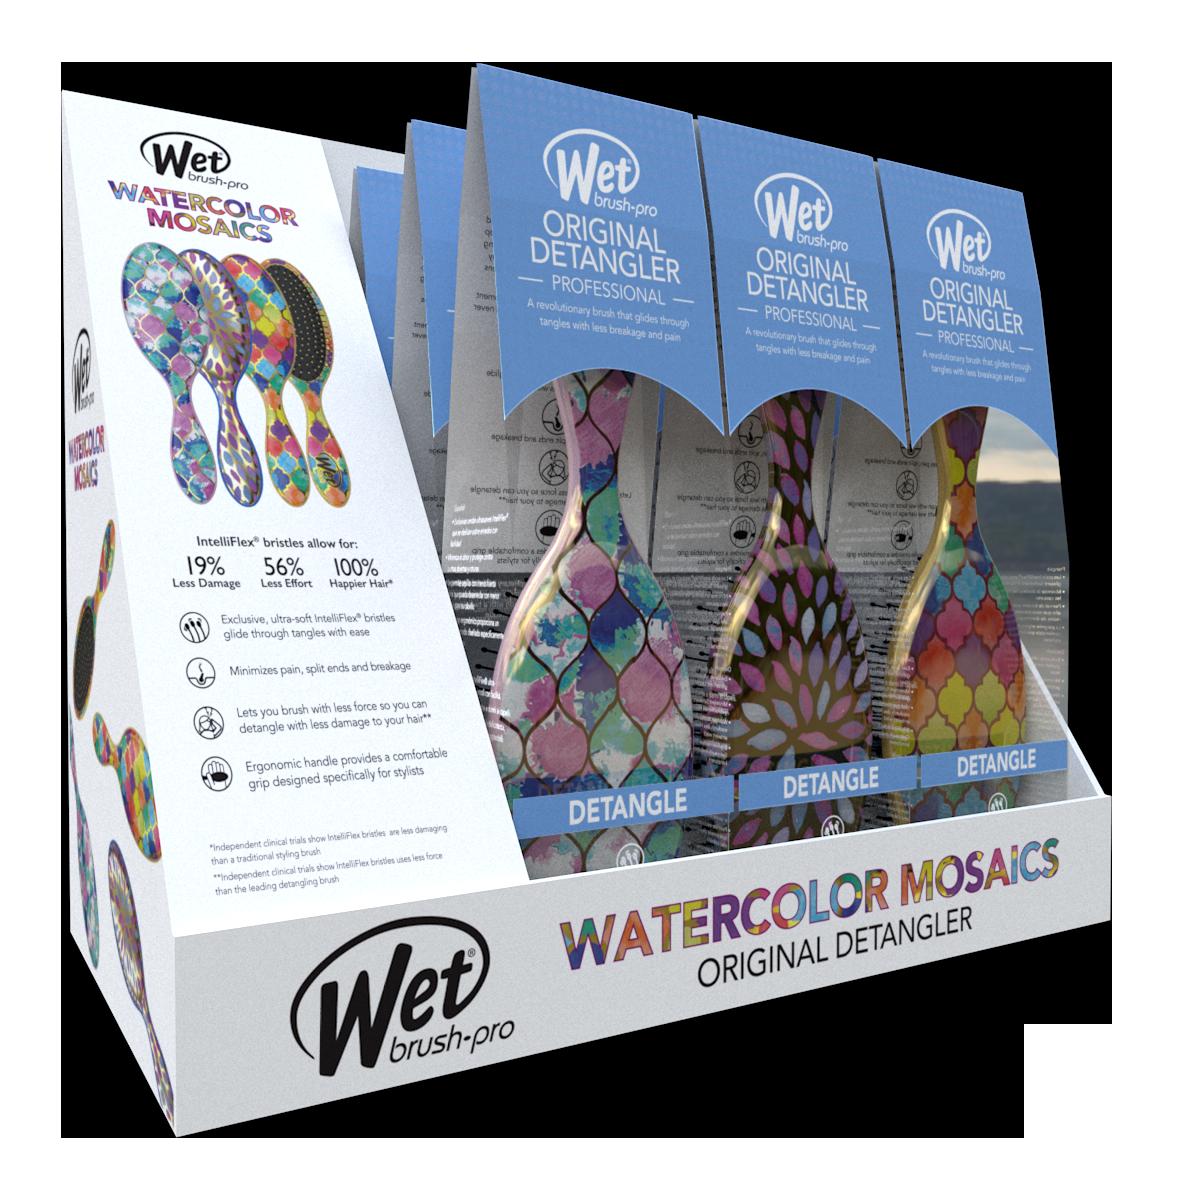 rocky bracero online portfolio - WetBrush PDQ Display Designs